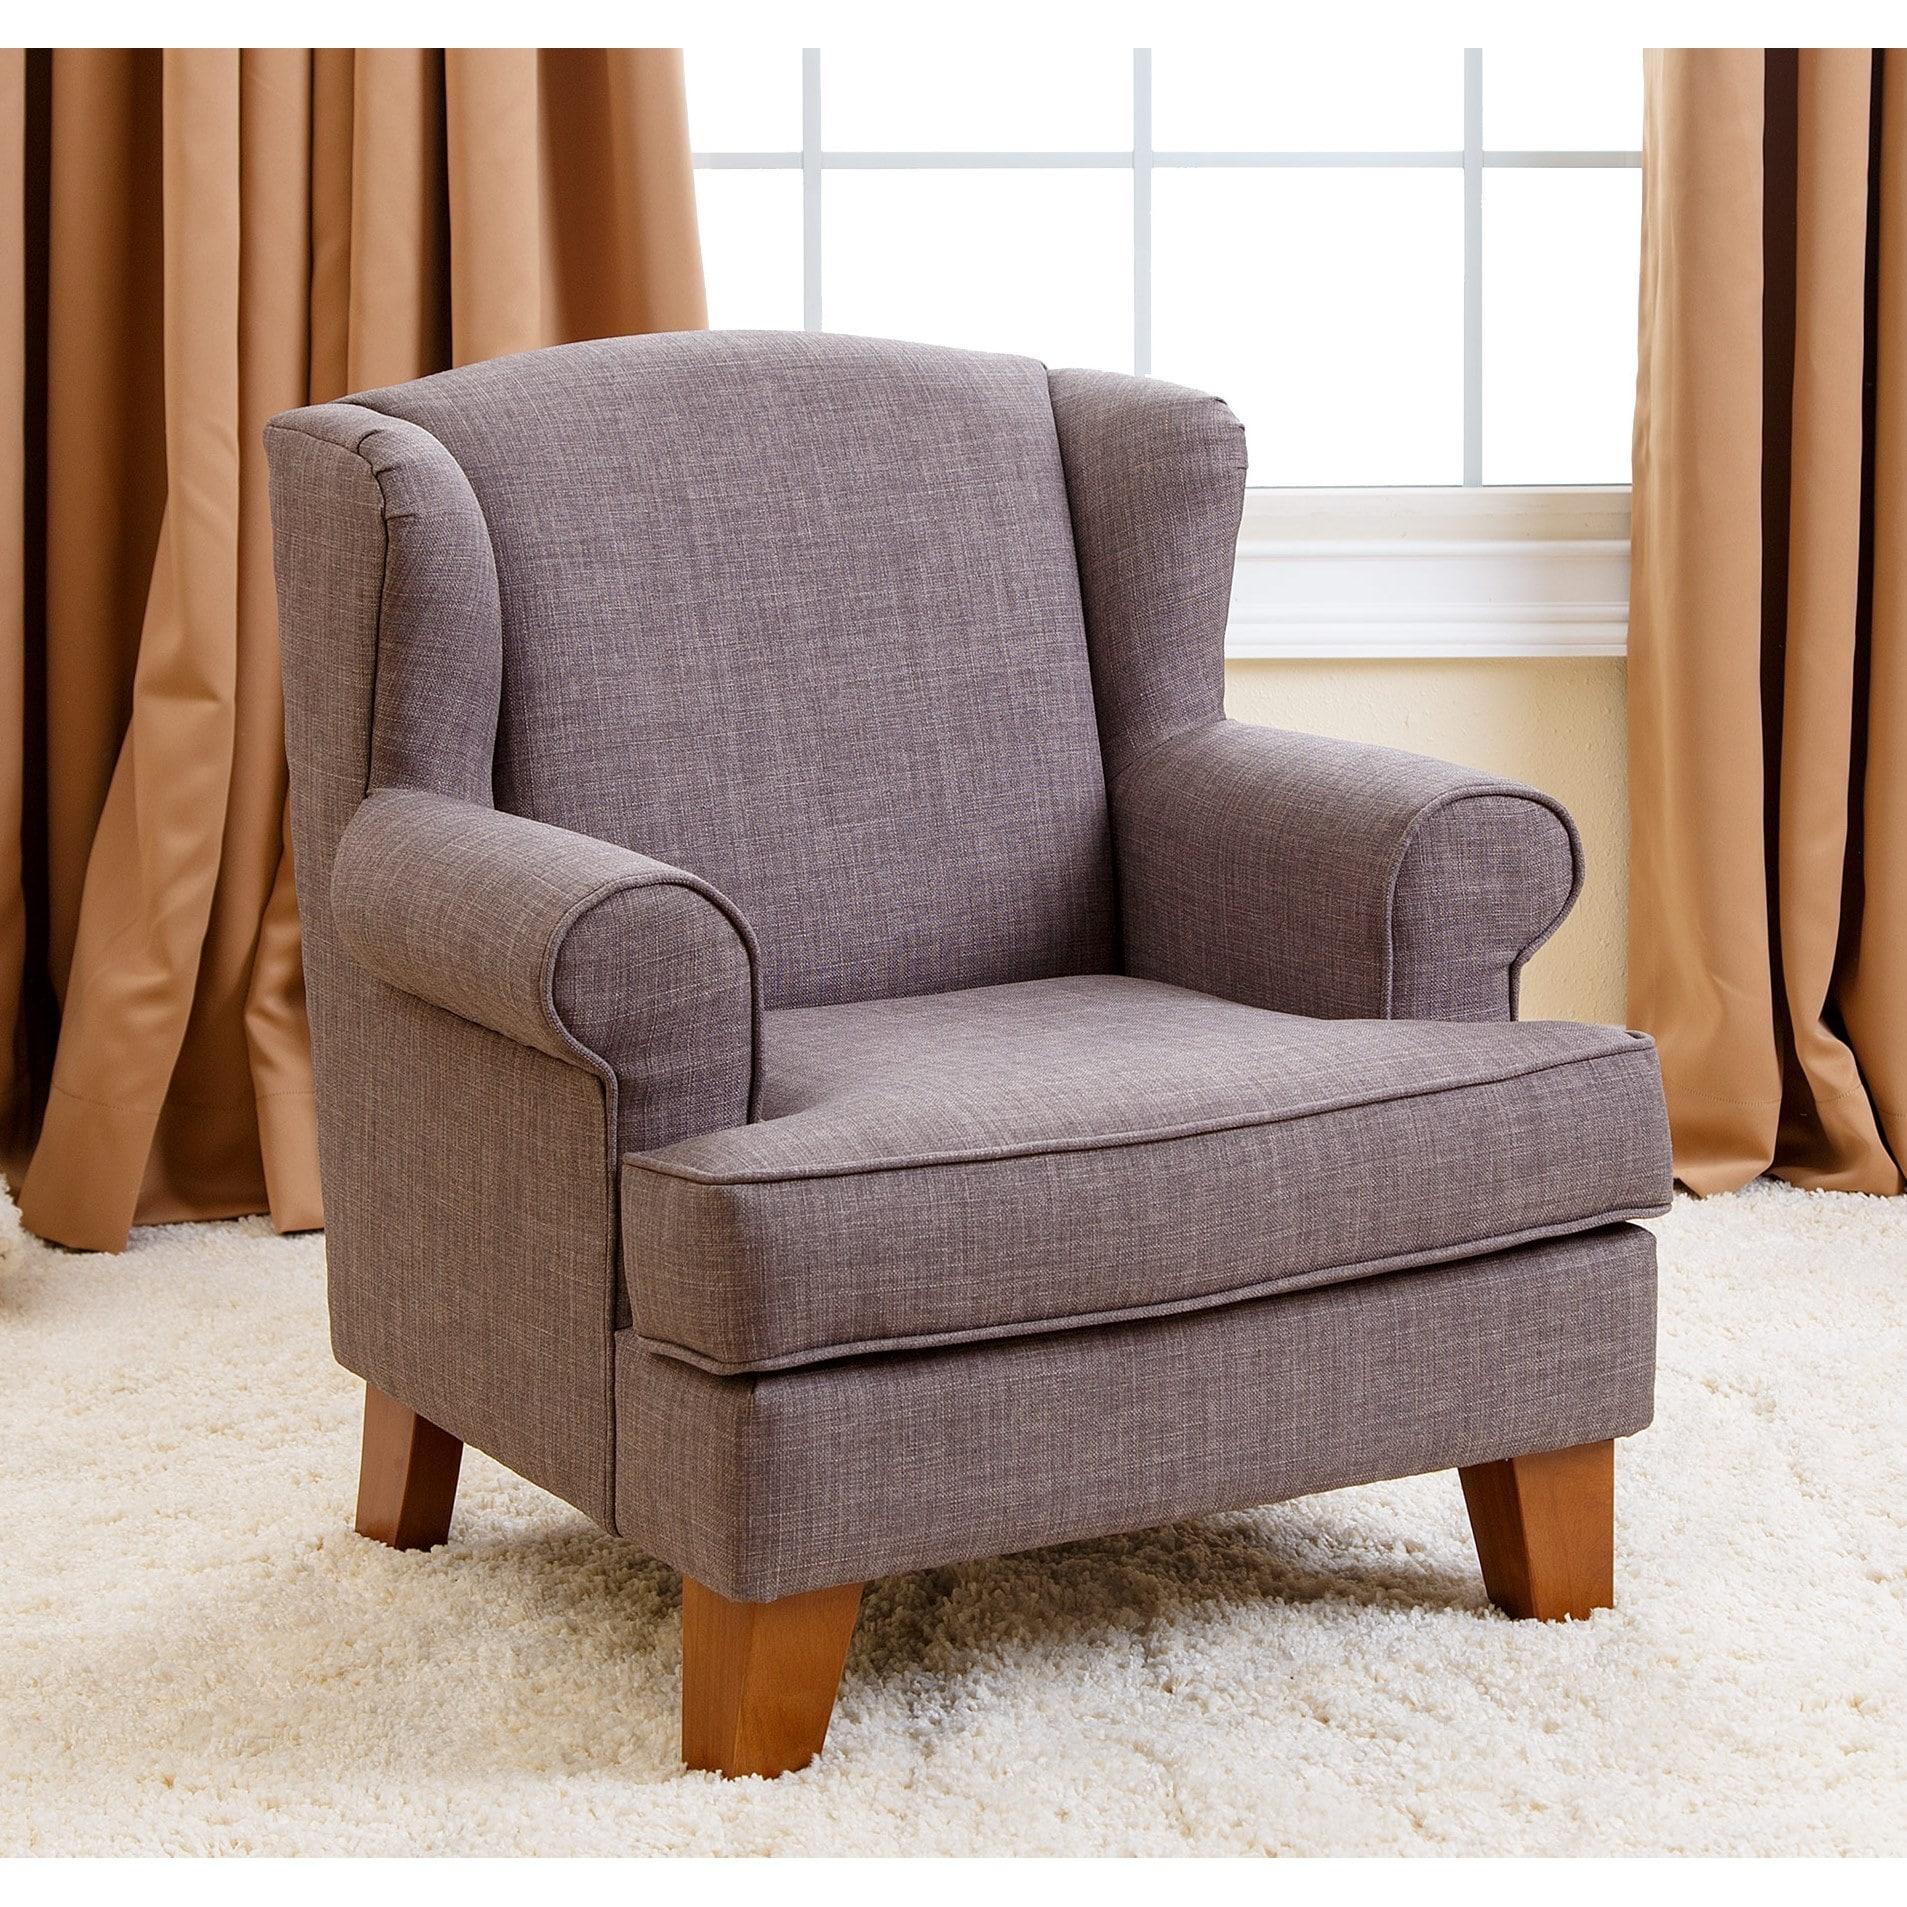 Merveilleux Shop Abbyson Kids Lorraine Wingback Grey Mini Chair   Free Shipping Today    Overstock.com   10562527